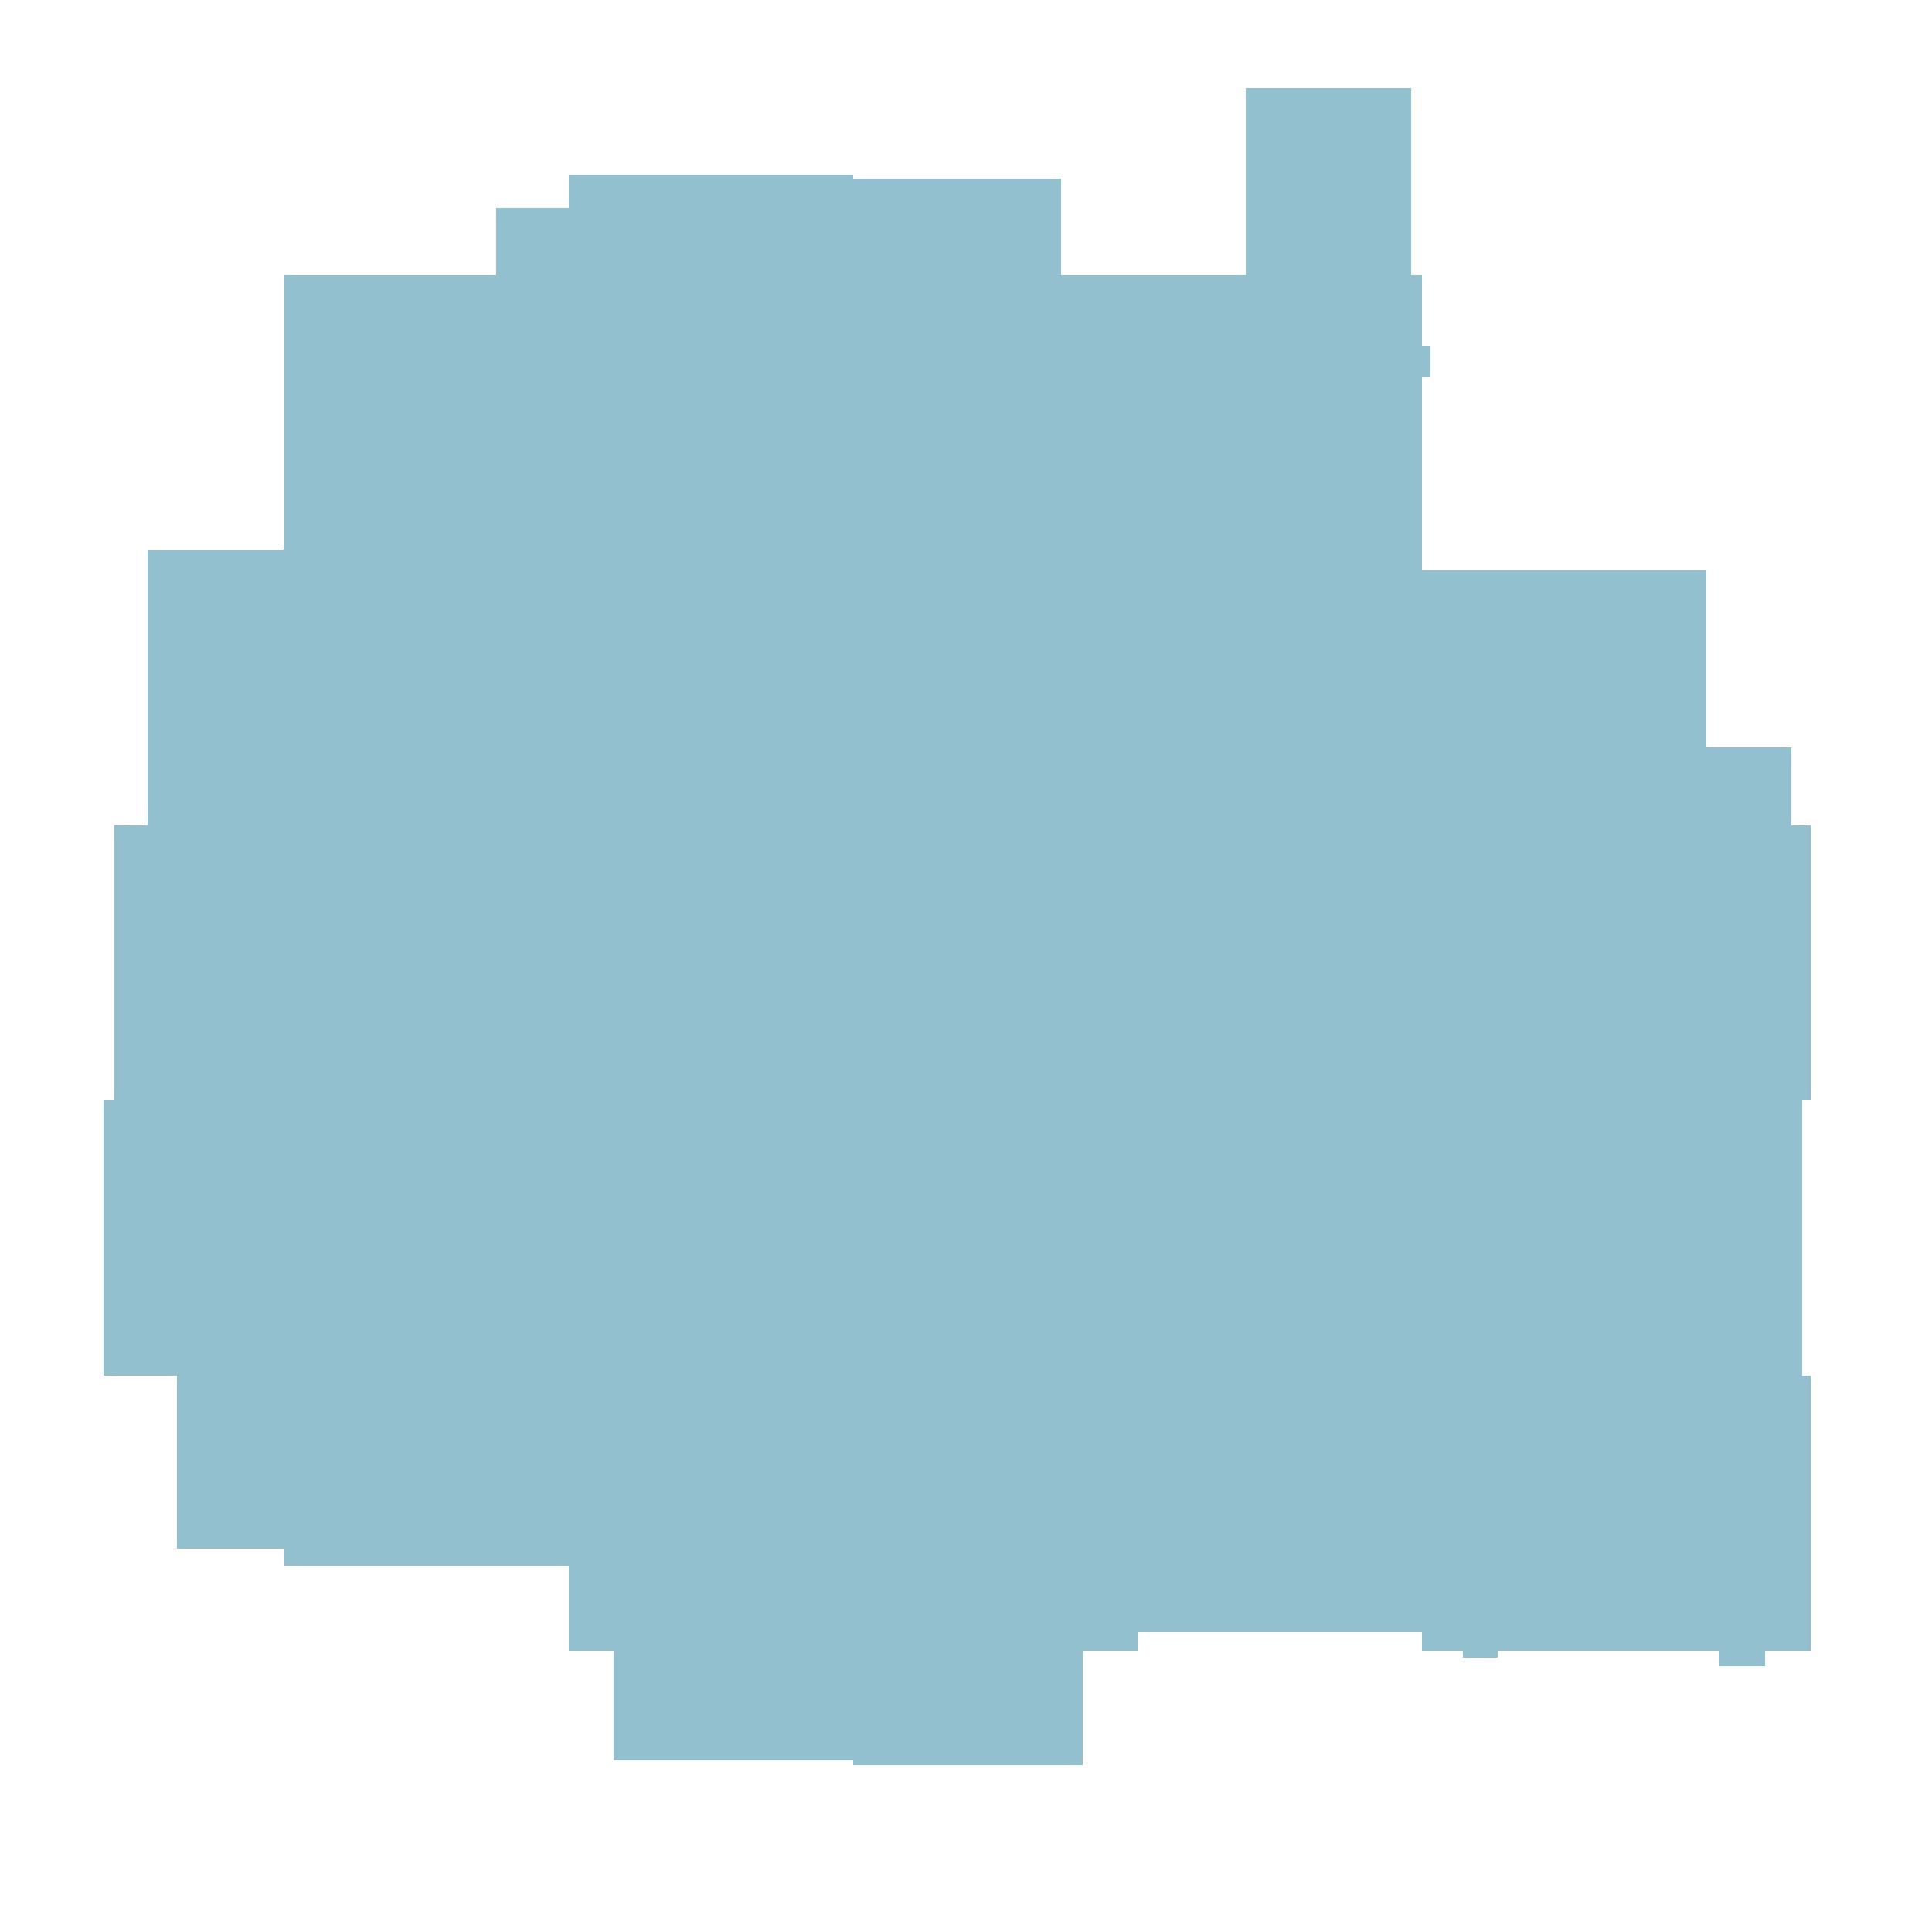 orodir game island 2